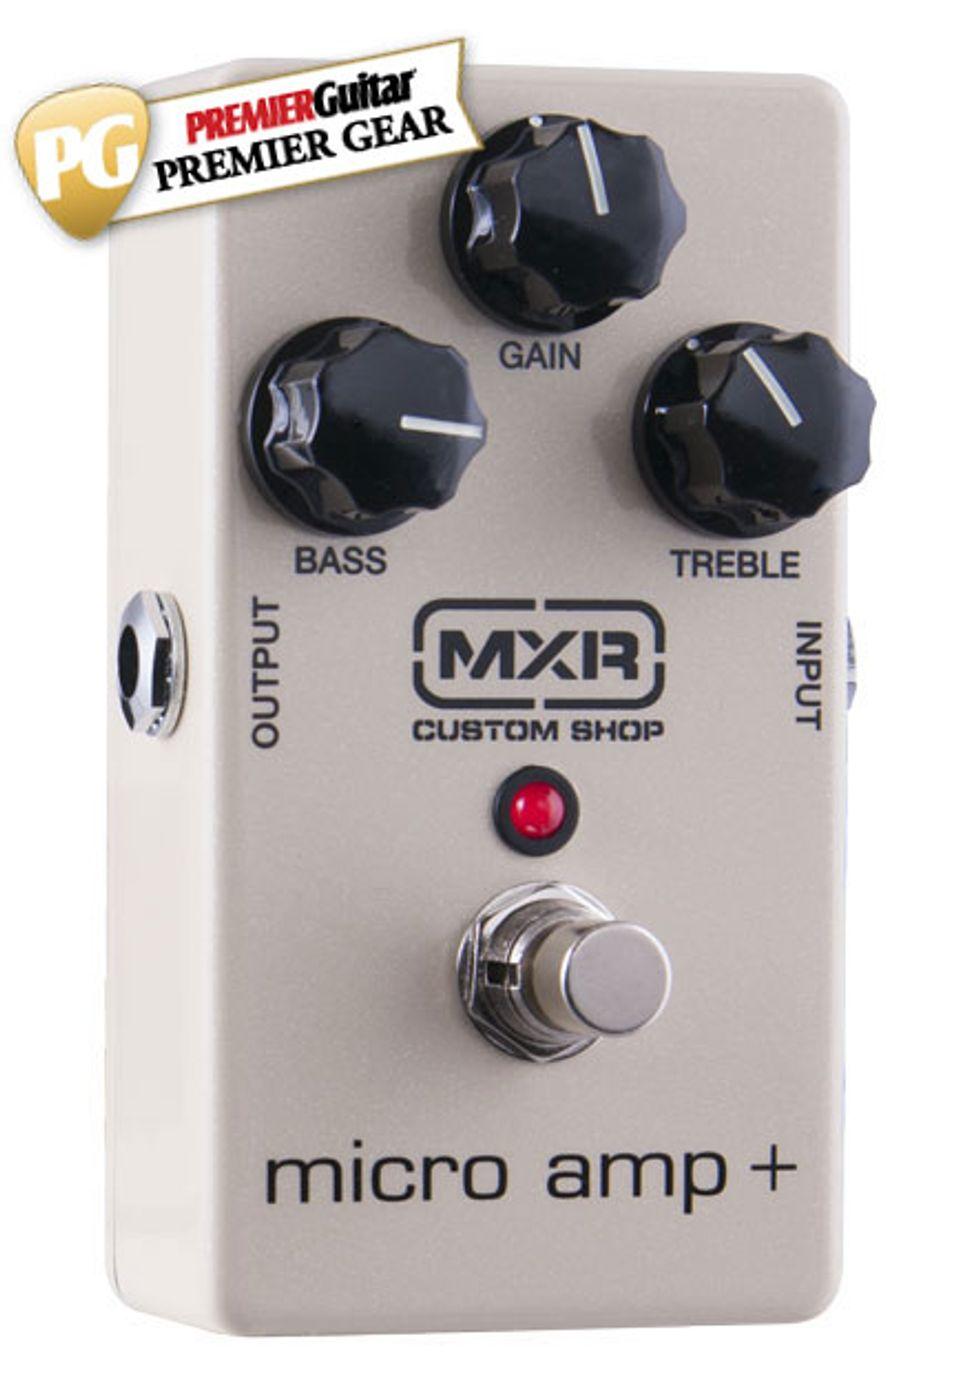 Toyota Little Rock >> MXR Custom Shop Micro Amp + Review | Premier Guitar